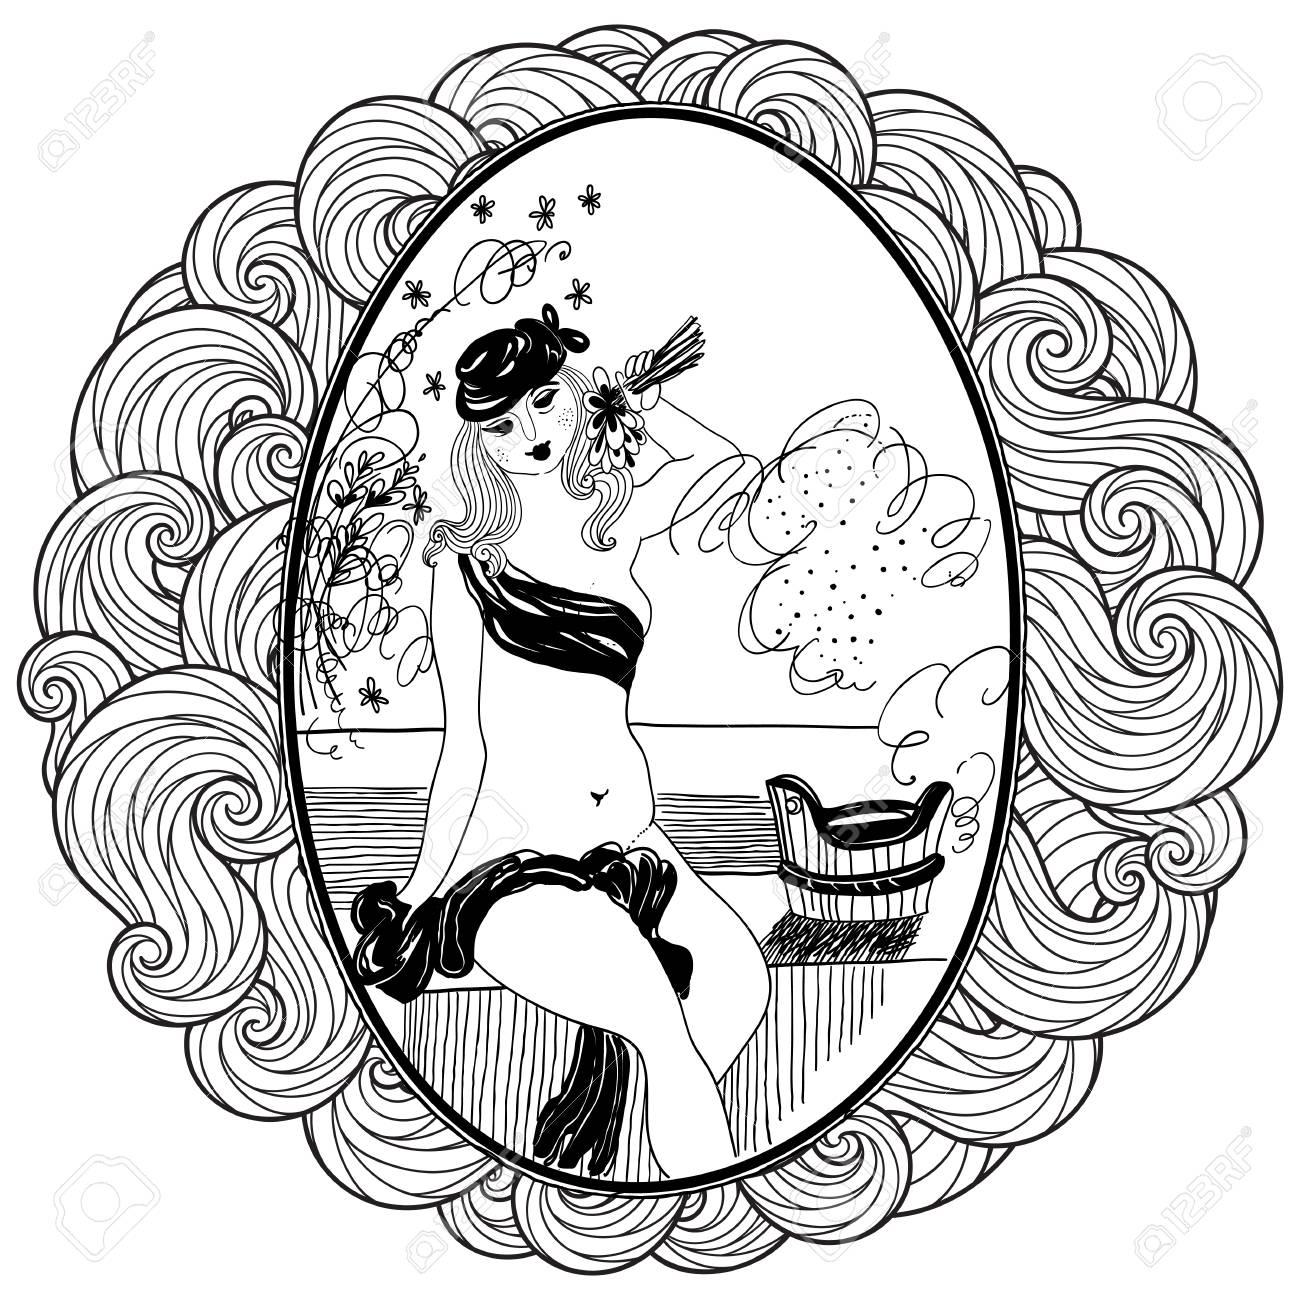 Excelente Chica Brotar Para Colorear Colección - Dibujos Para ...